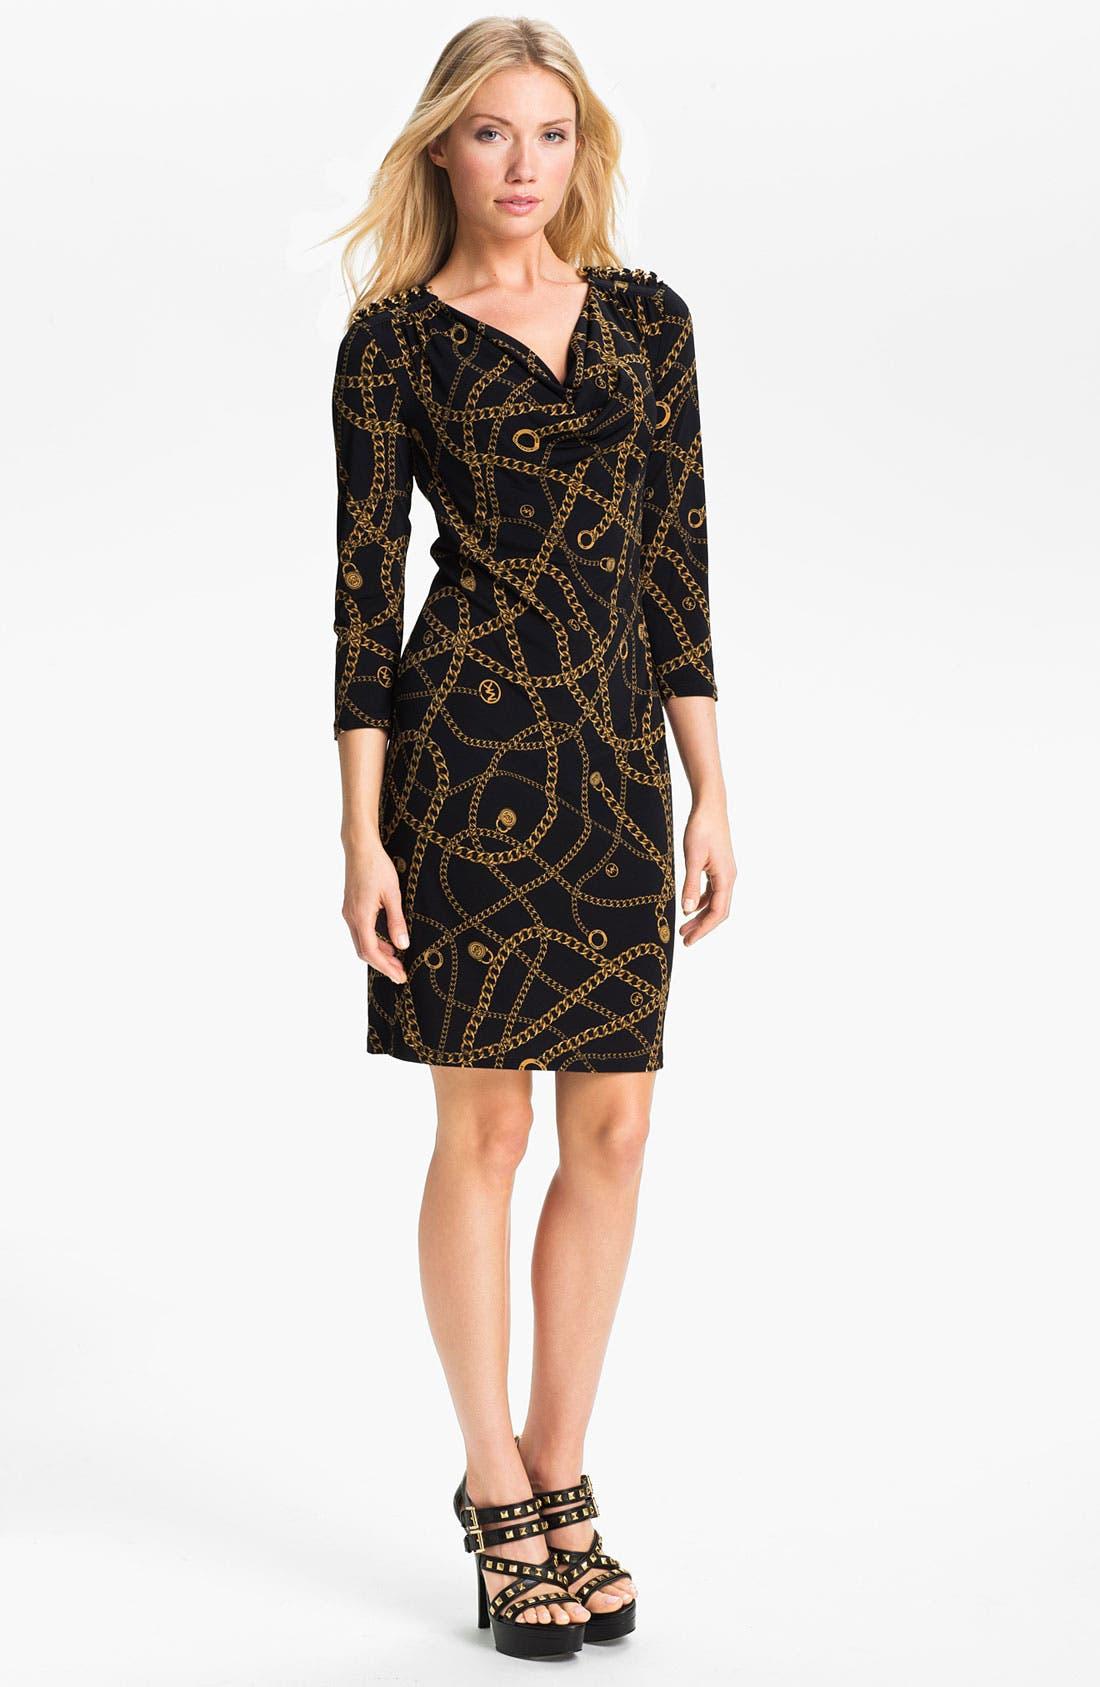 Alternate Image 1 Selected - MICHAEL Michael Kors 'Hamilton' Chain Print Dress (Petite)